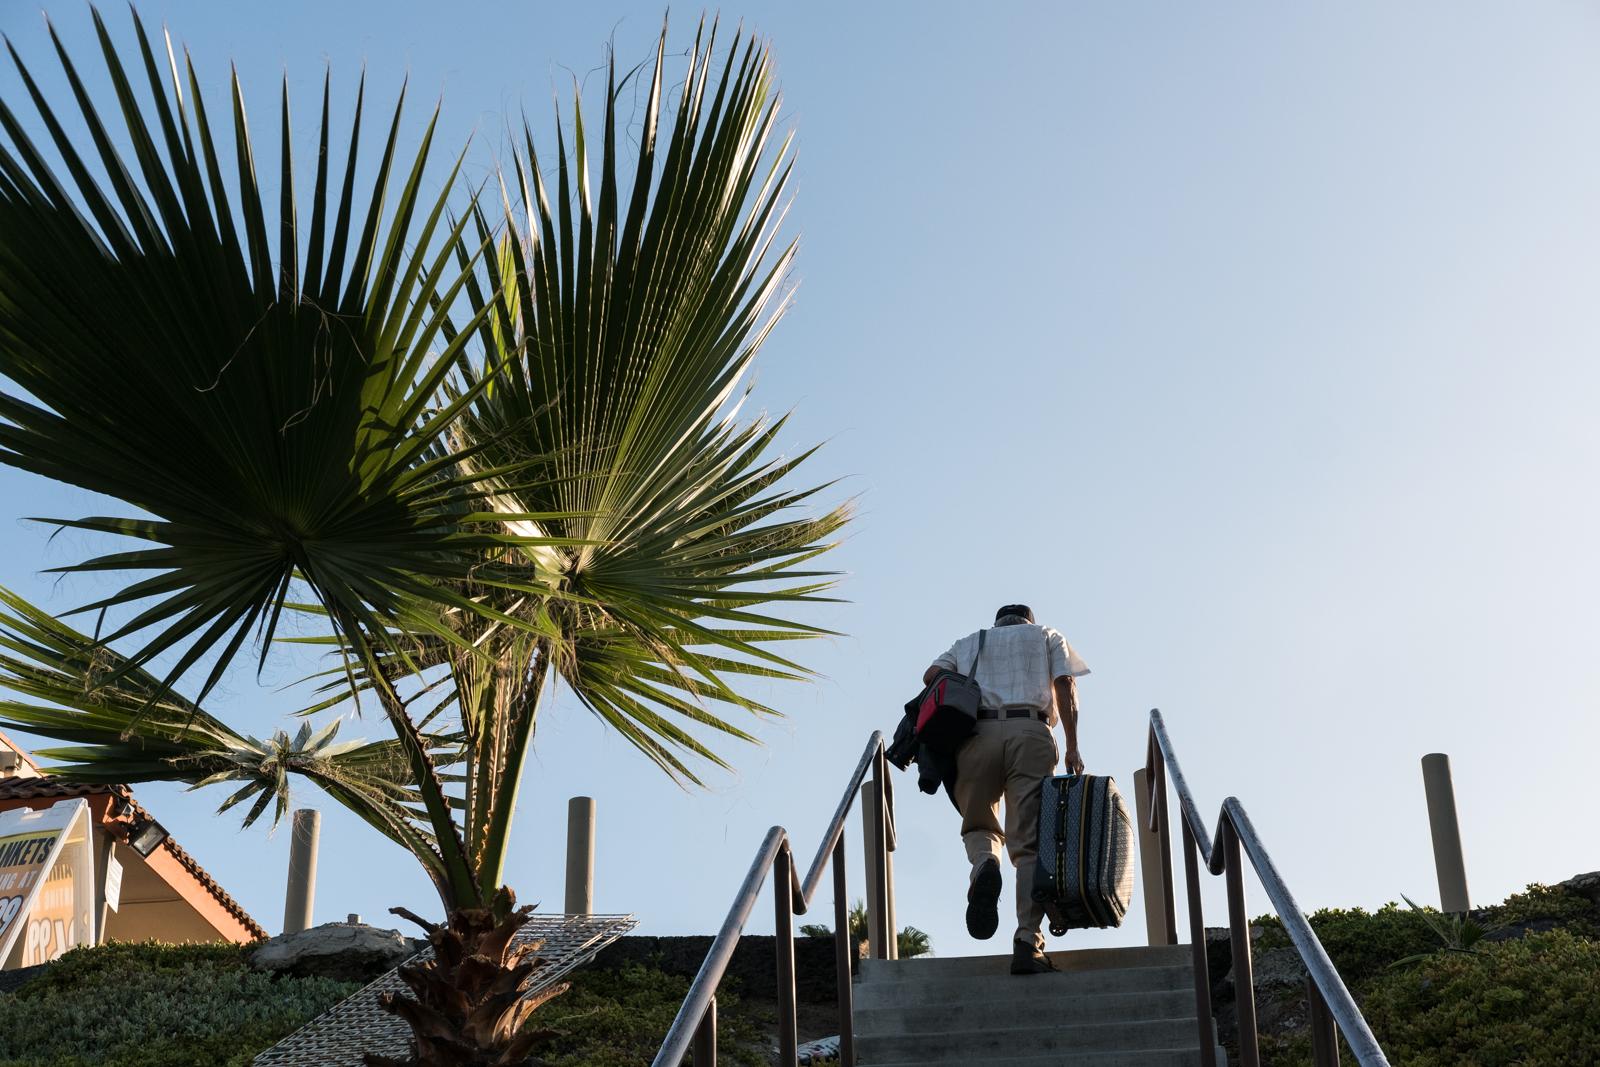 12. Hinterland - Coming or going in San Ysidro, CA.jpg